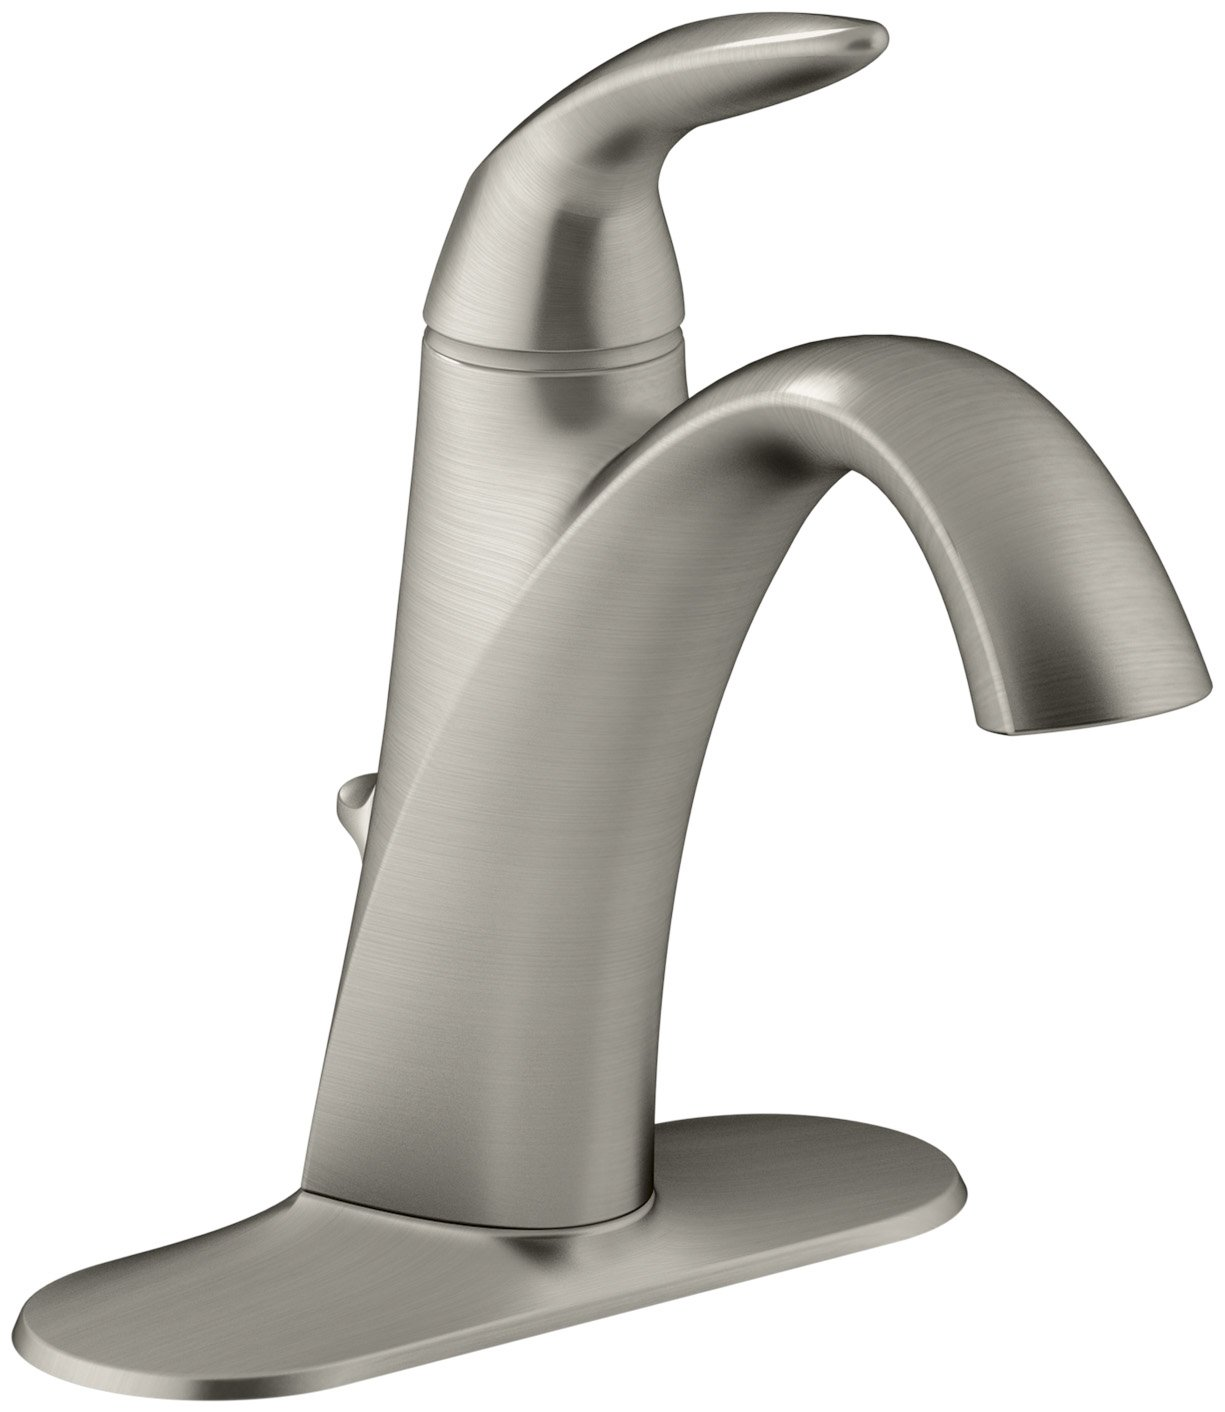 Kohler K Cp Alteo Single Handle Bathroom Sink Faucet